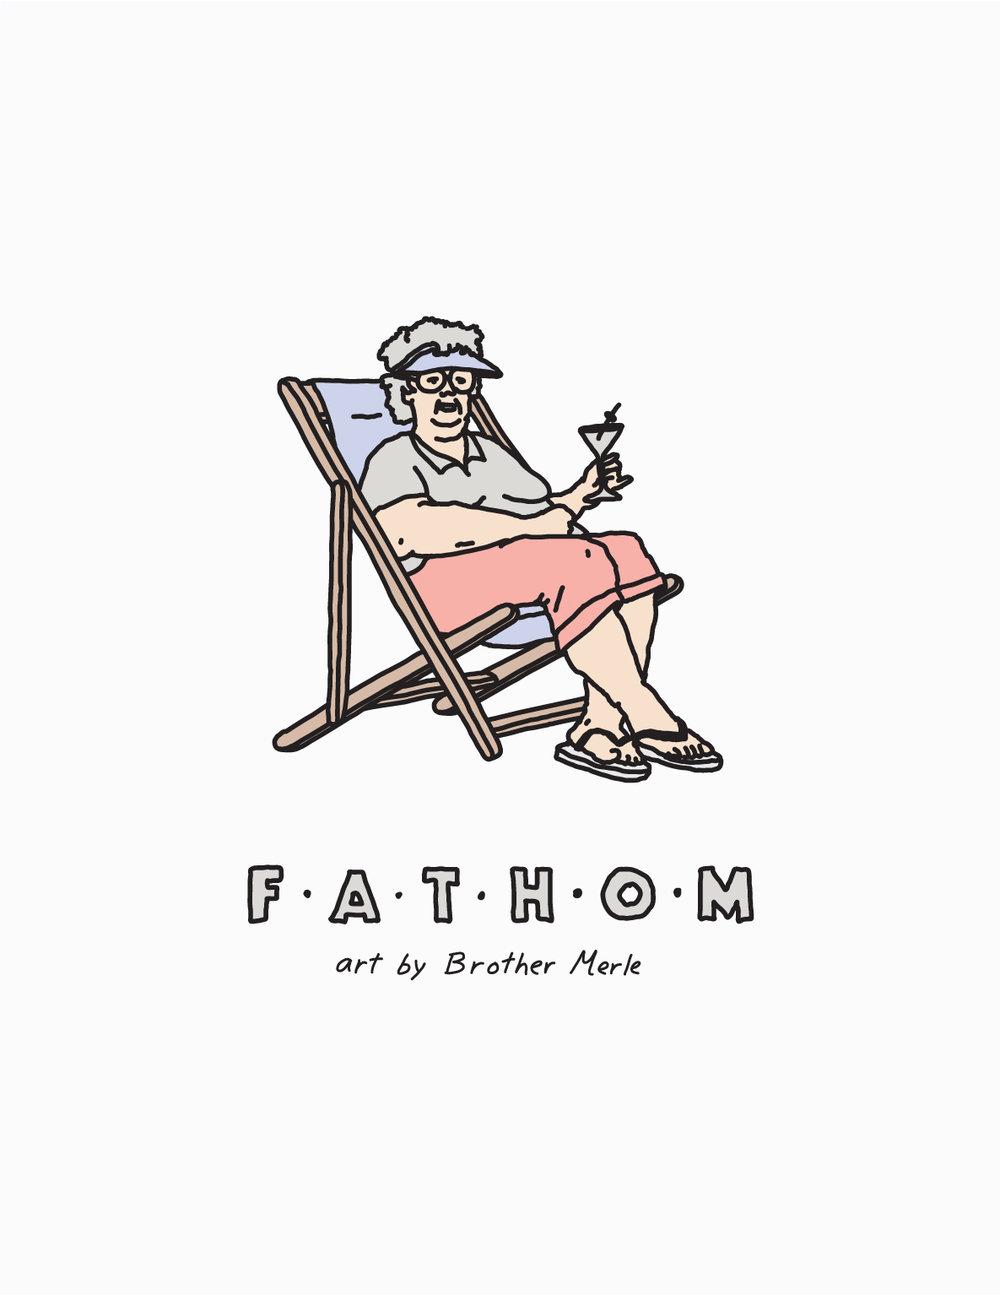 BrotherMerle-Fathom.jpg